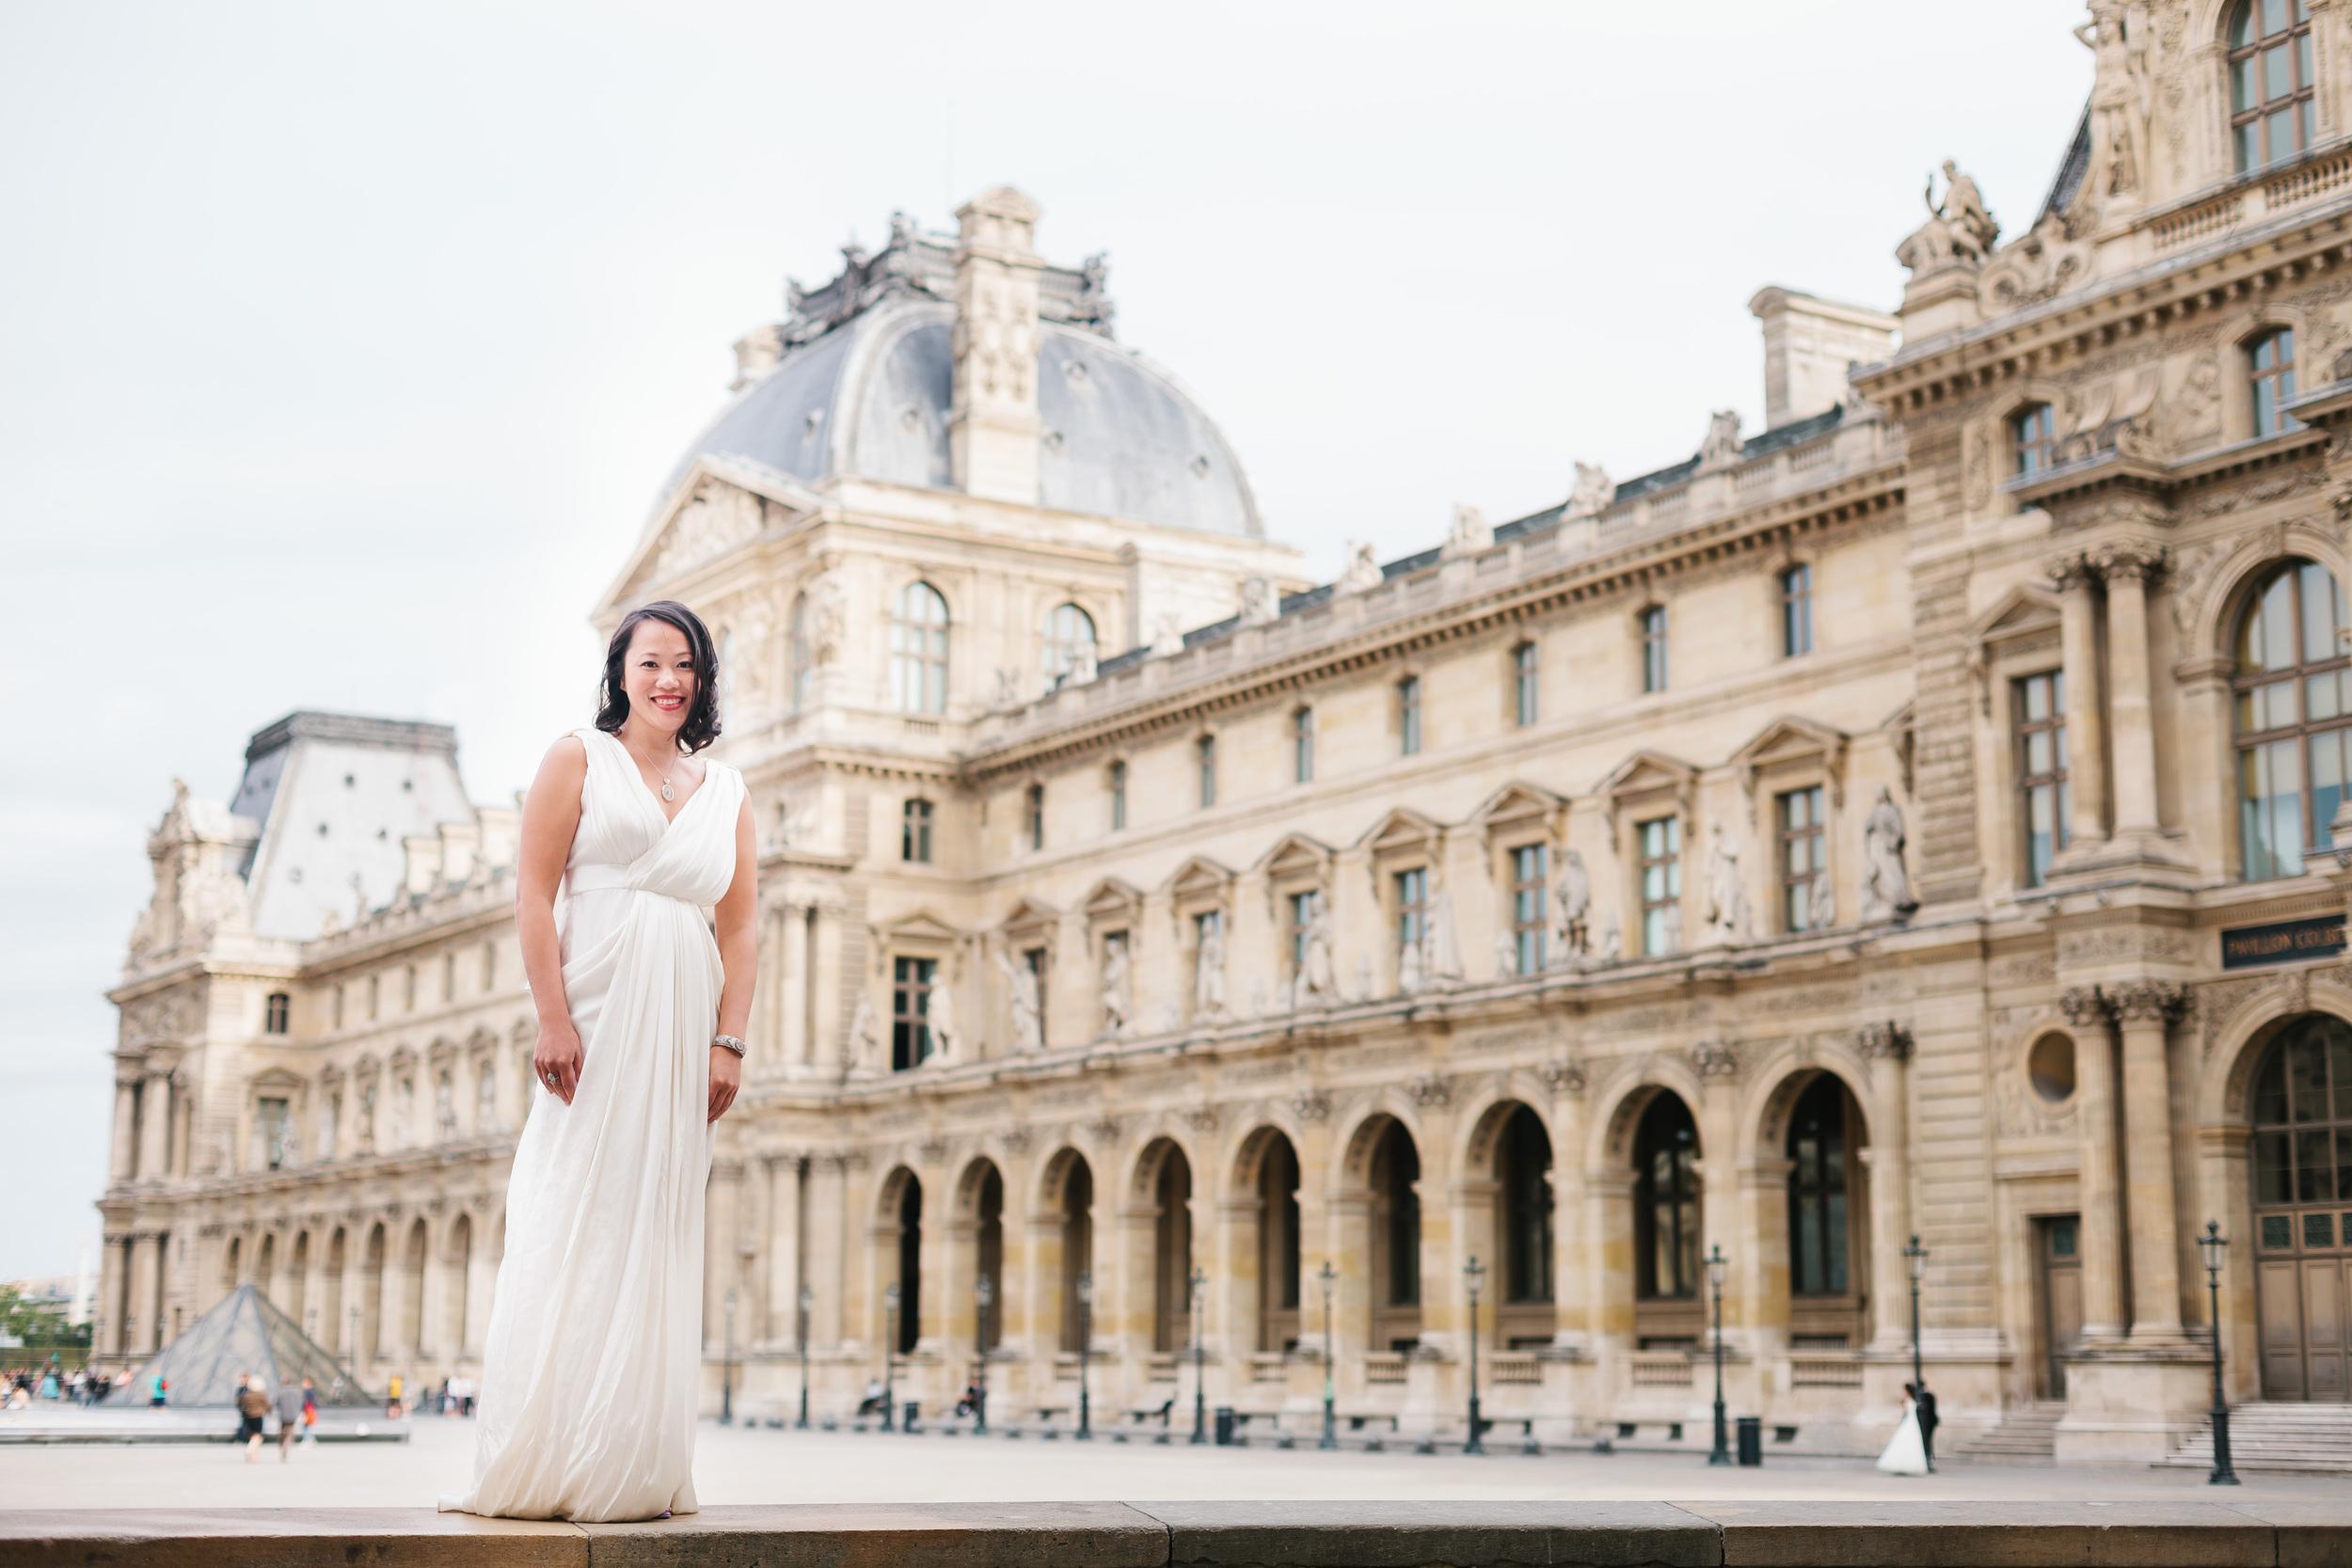 Photographer in Paris, The Louvre, Birthday, individual portrait, IheartParisfr